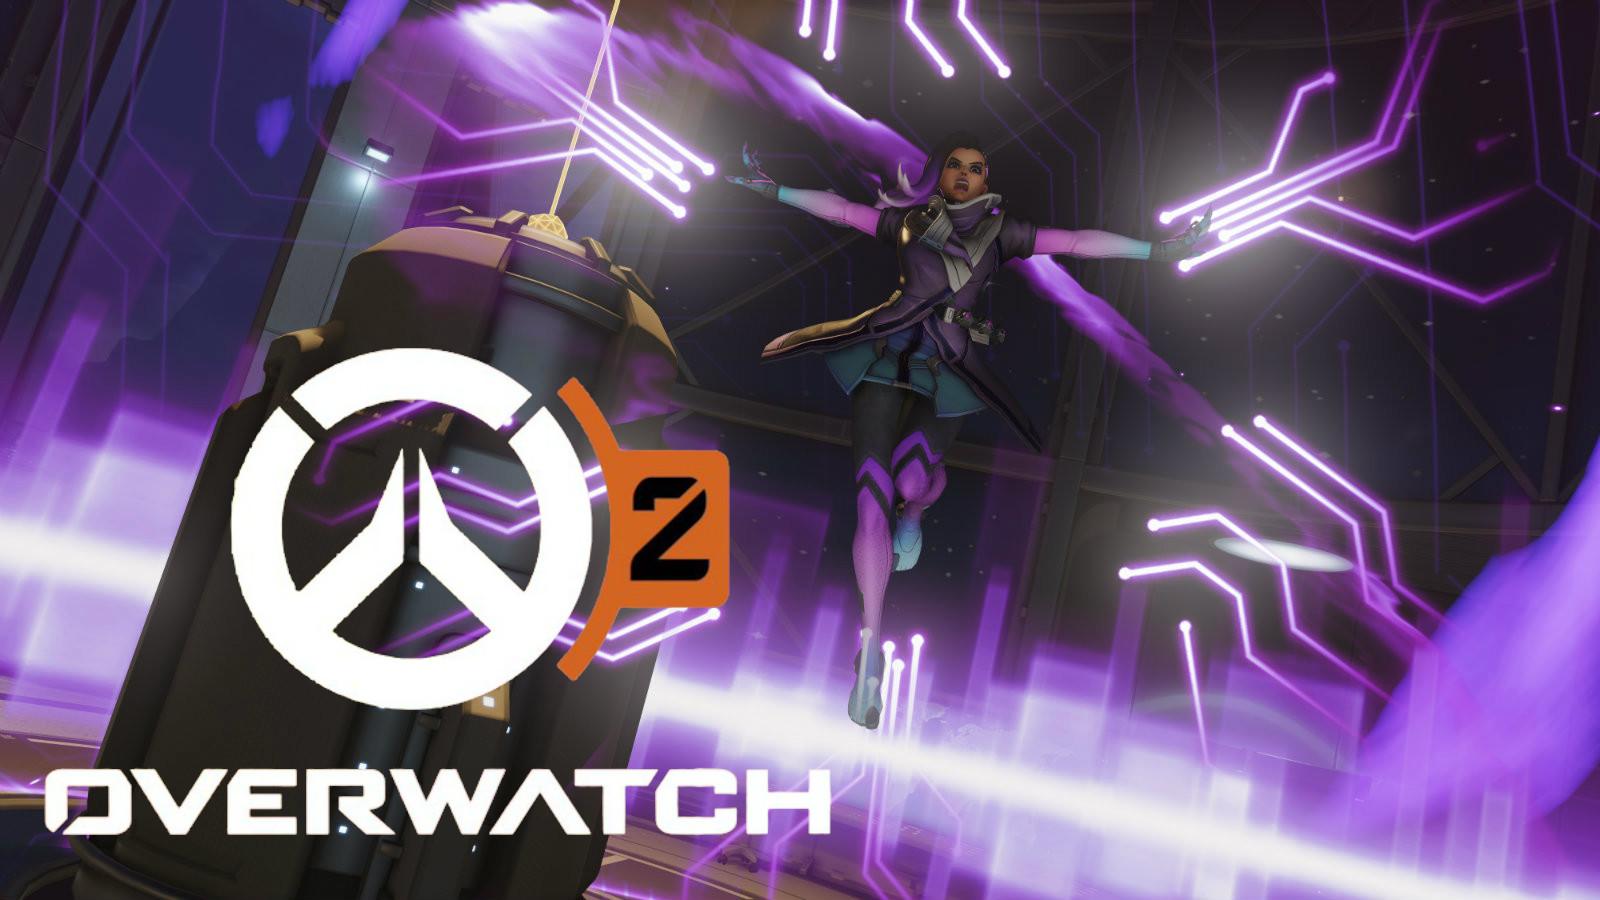 Sombra activates EMP in Overwatch 2